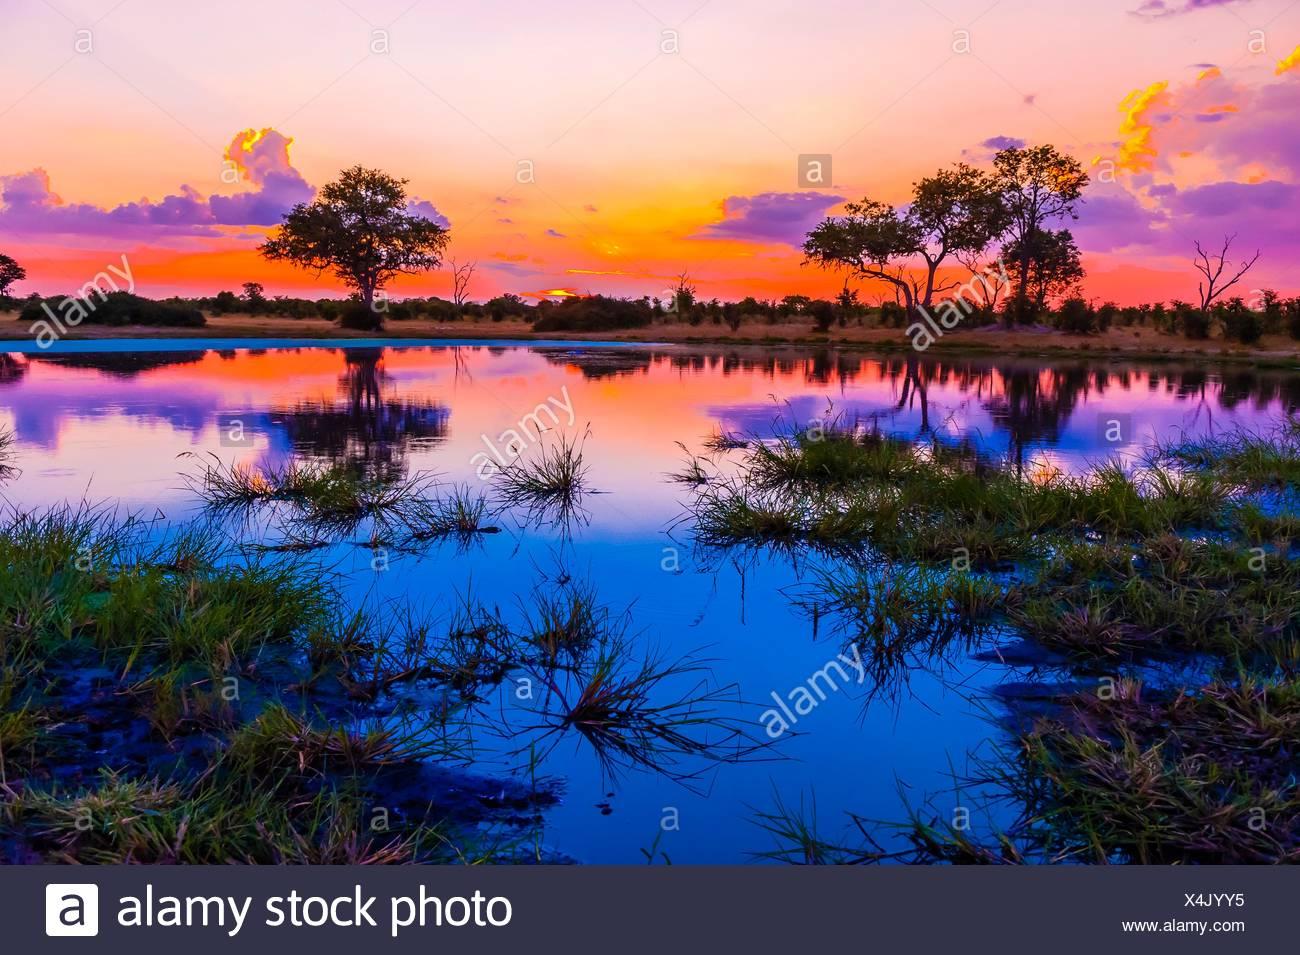 Twilight at a pond, Kwando Concession, Linyanti Marshes, Botswana. Stock Photo